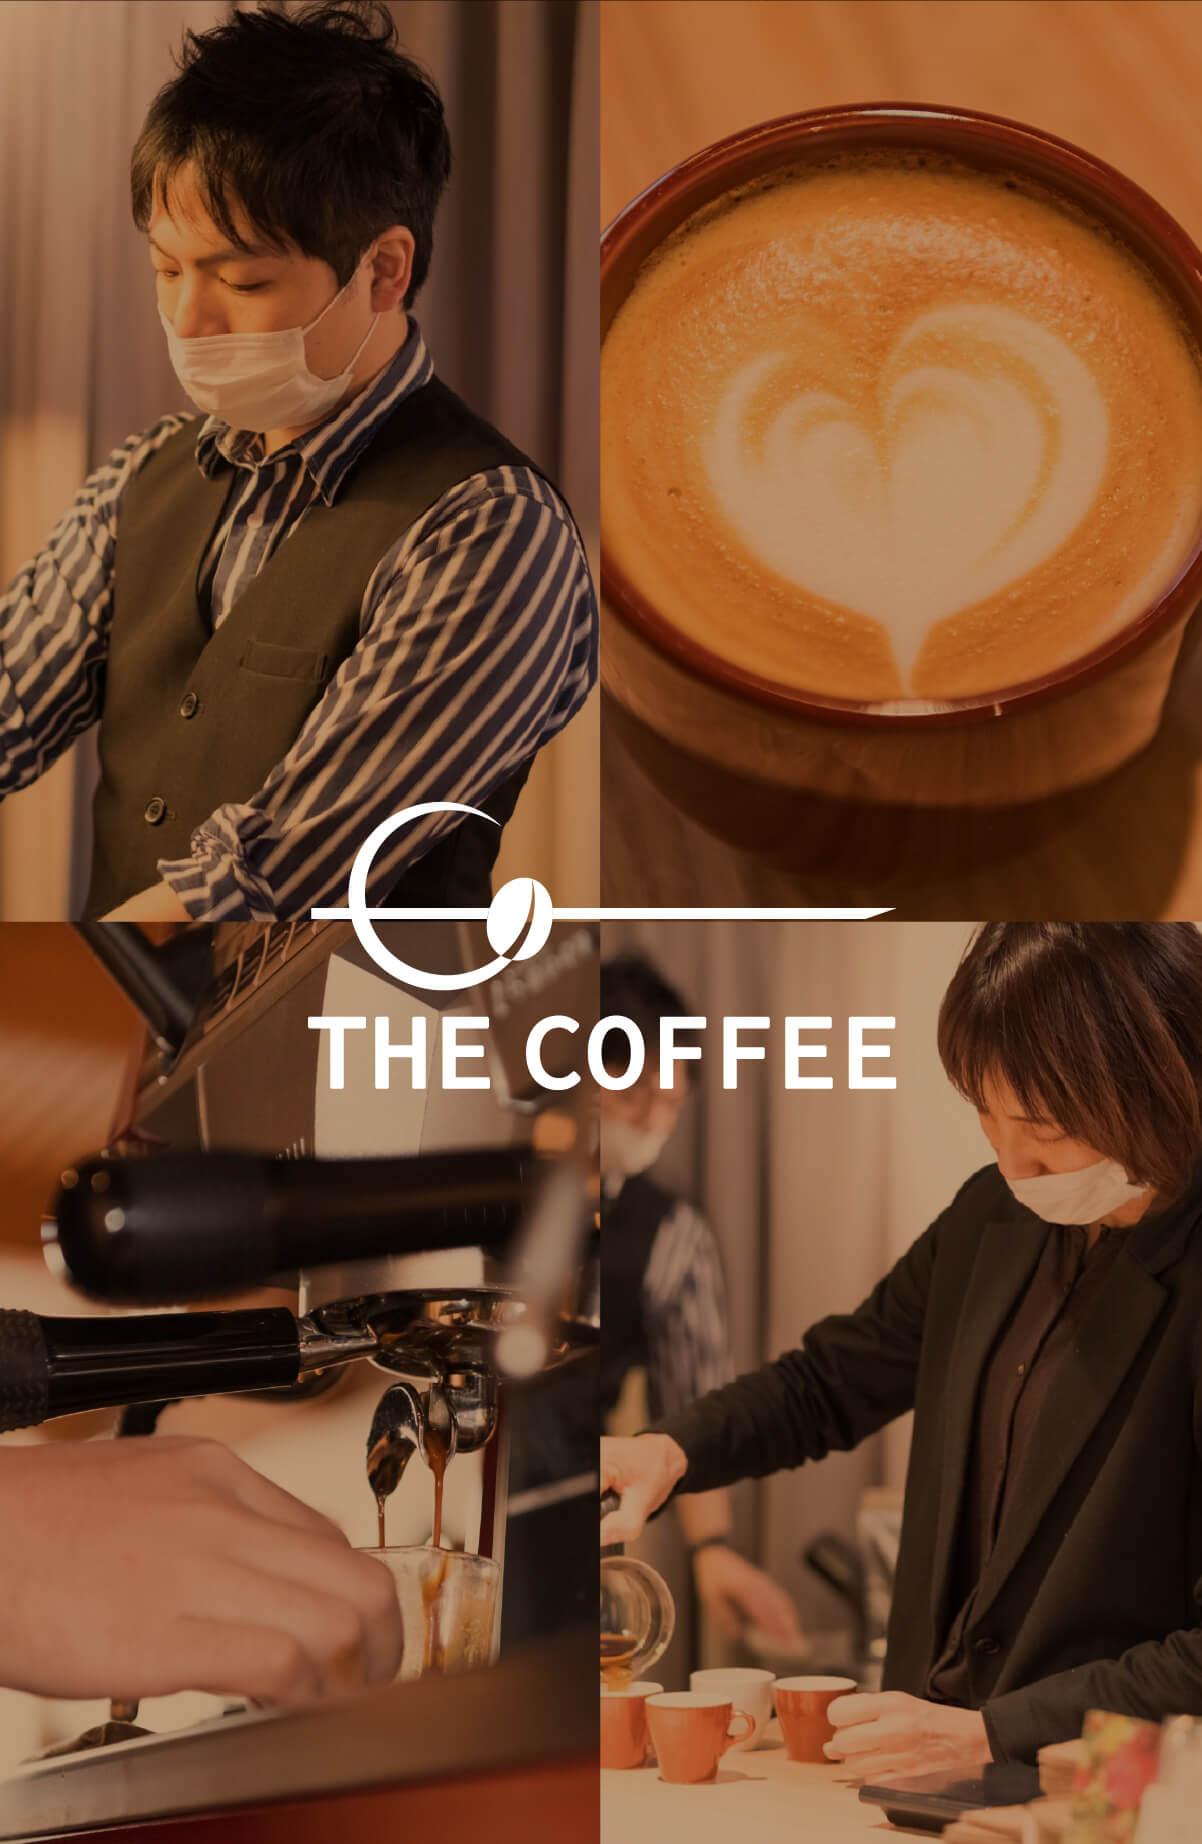 THE COFFEE(ザ コーヒー)